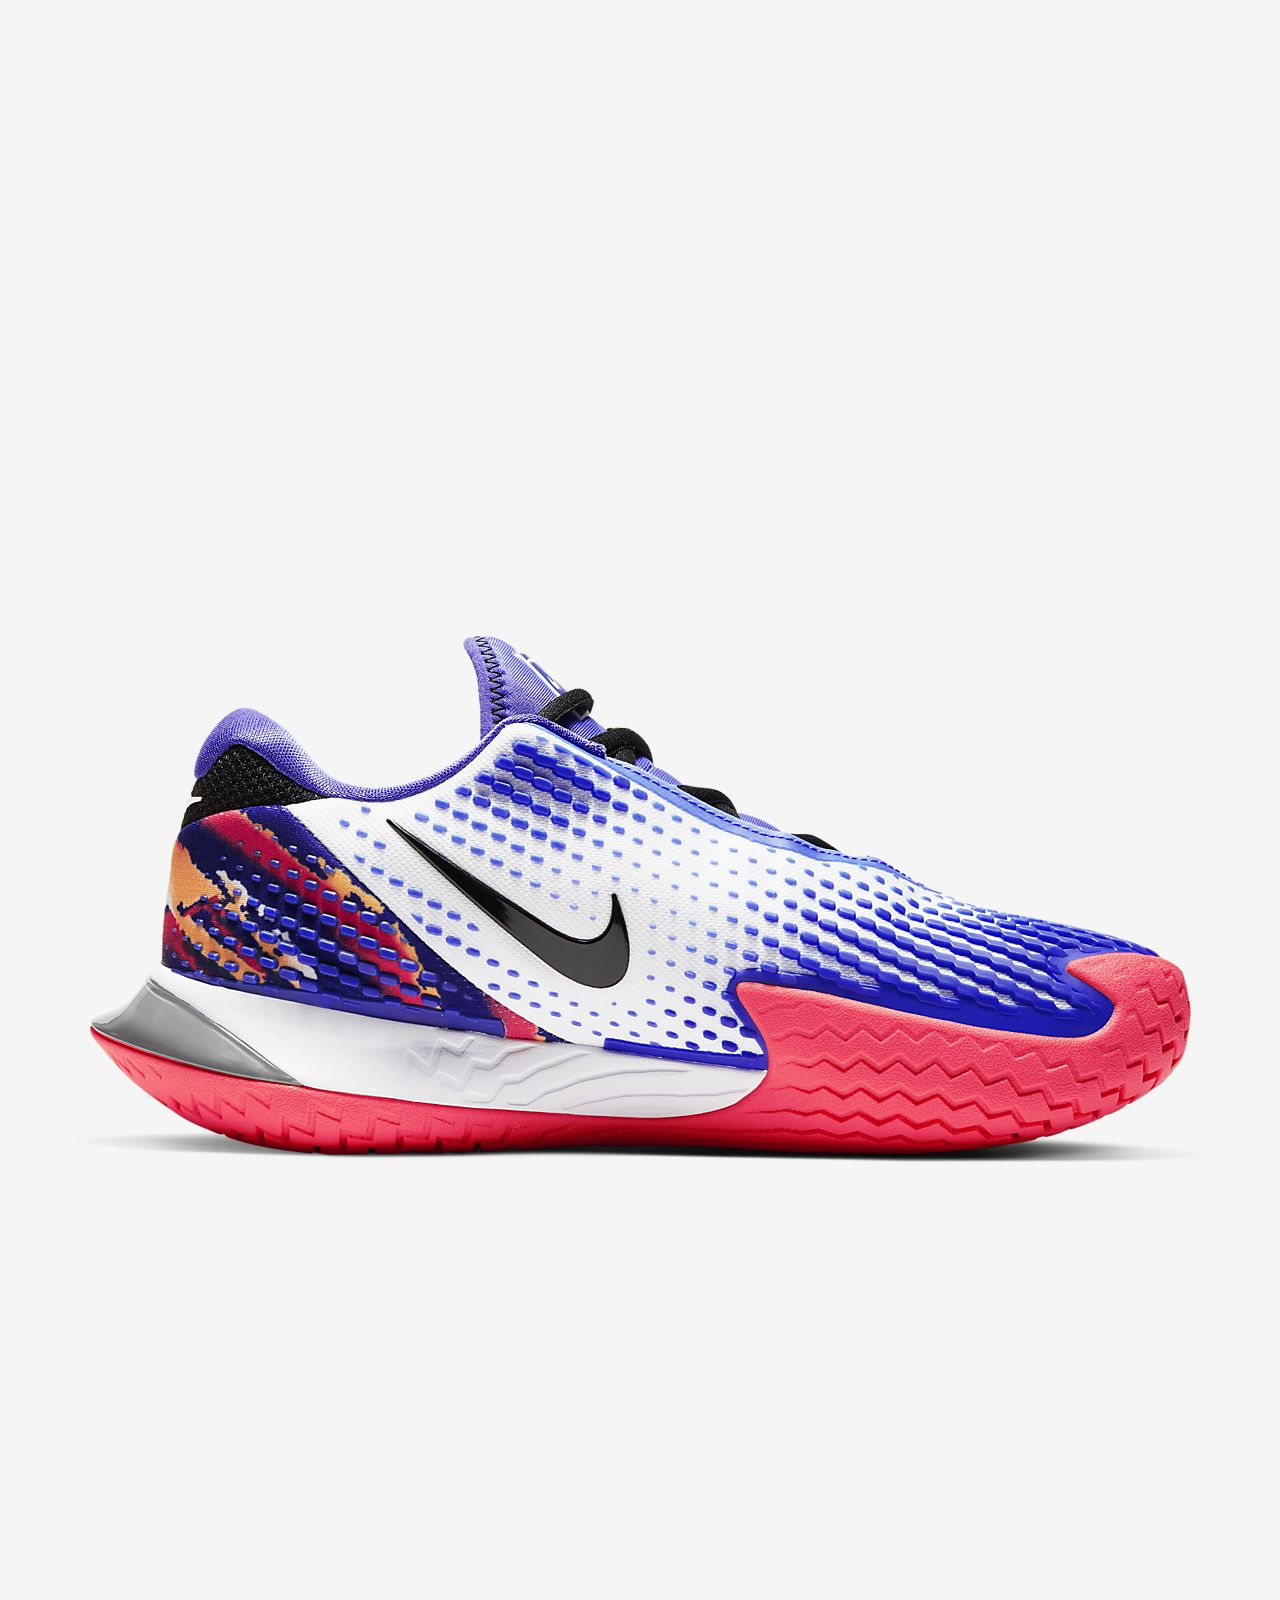 Buy Cheap Nike Tennis Shoes Australia,Nikecourt Zoom Vapor